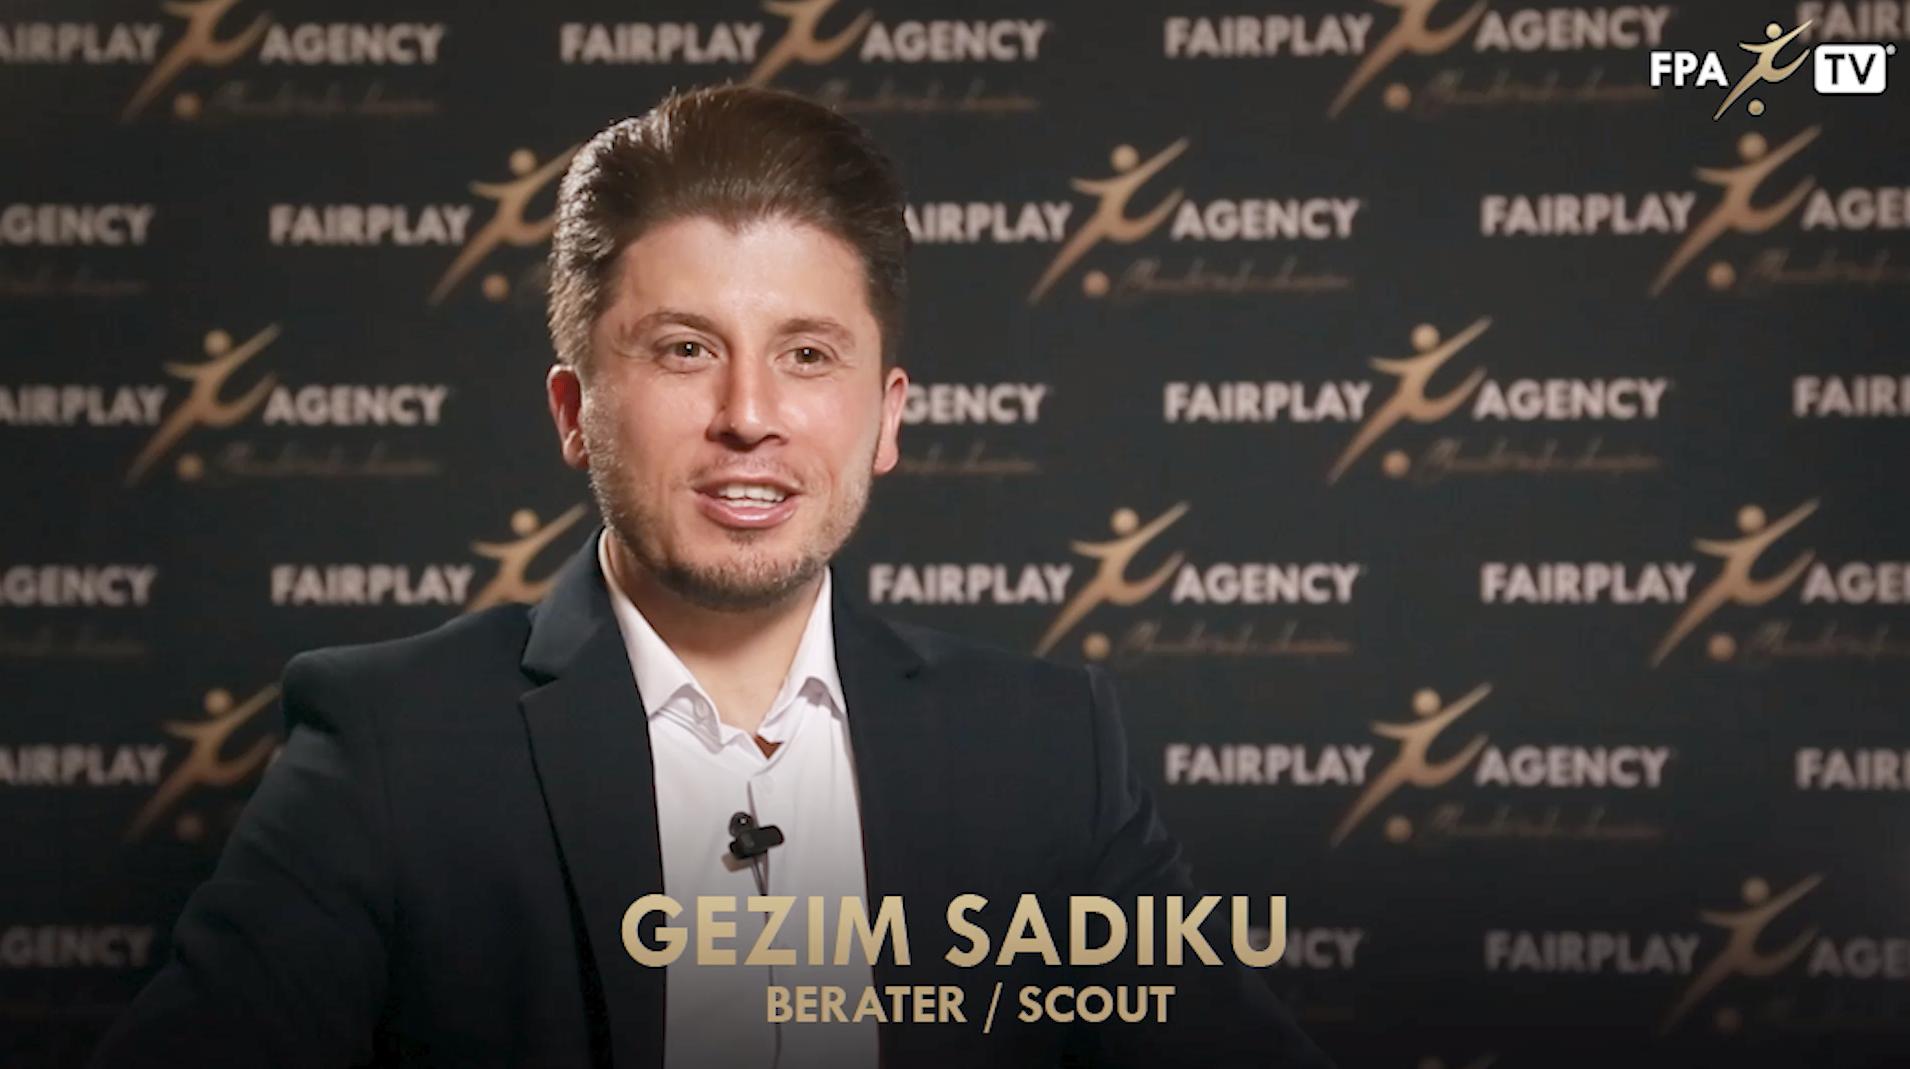 FPA Portrait: Gezim Sadiku, Scout and Agent